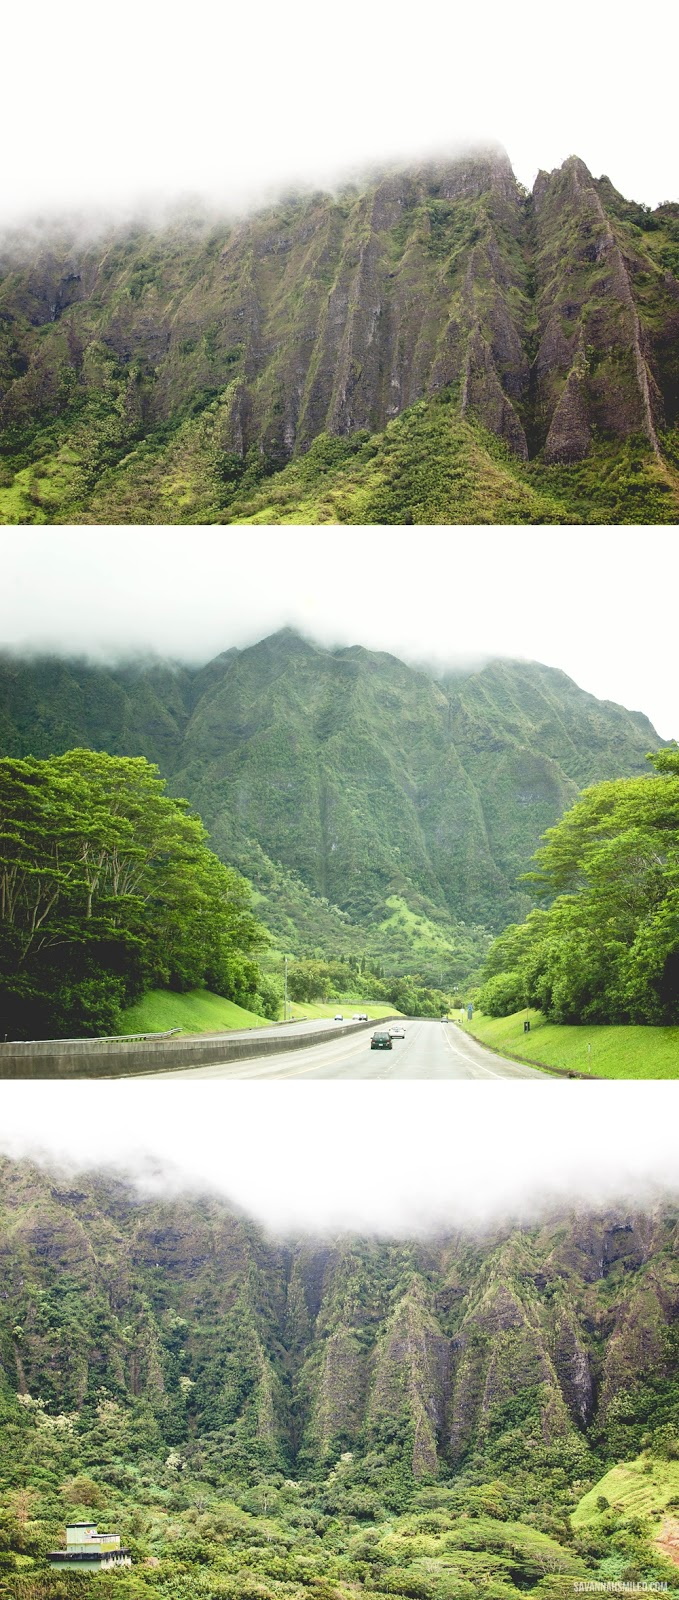 easter-hawaii-landscape-travel-pictures-8.jpg